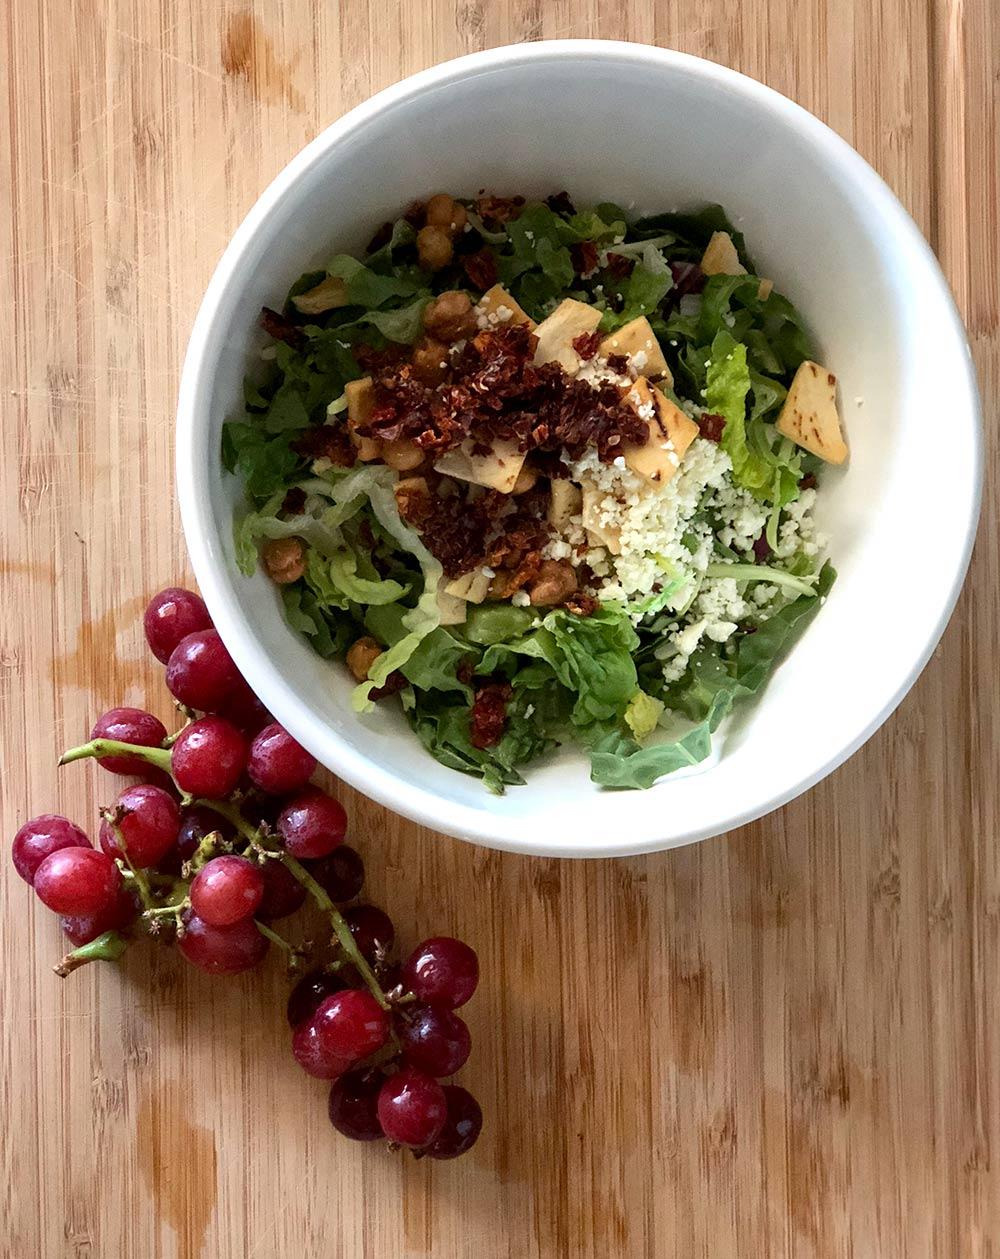 trader joes hacks salad in bowl with grapes